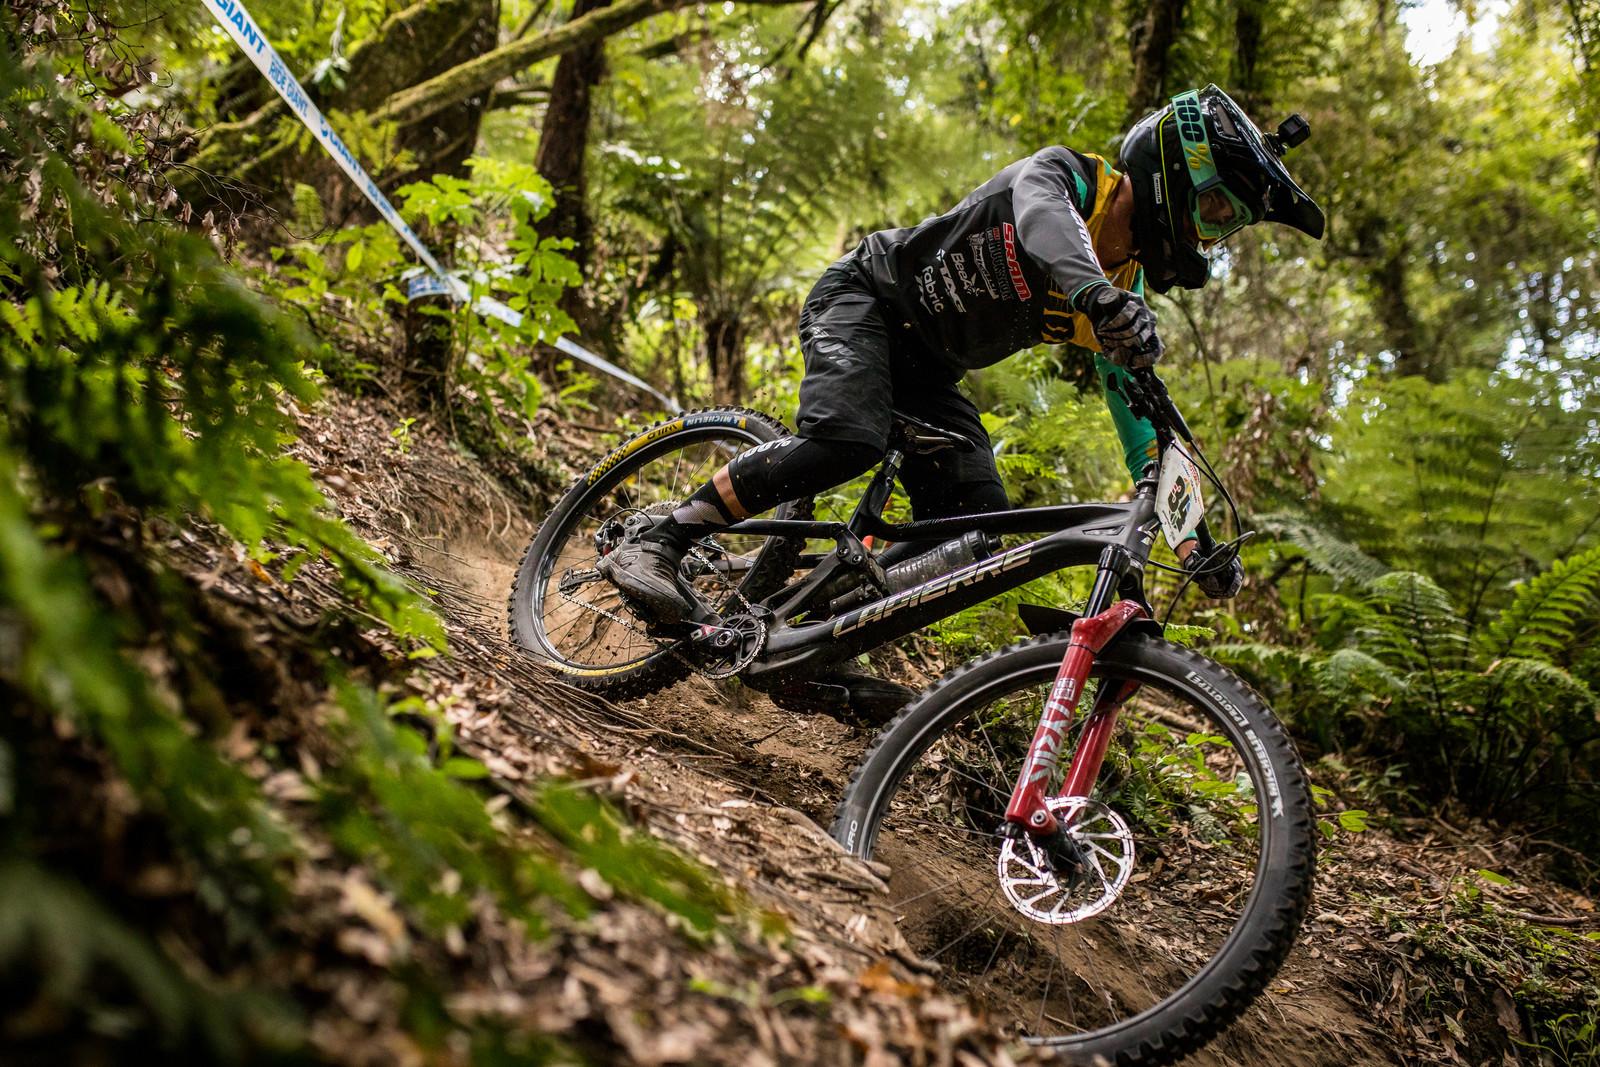 Look Closely - 2019 Enduro World Series Crankworx Rotorua - Mountain Biking Pictures - Vital MTB